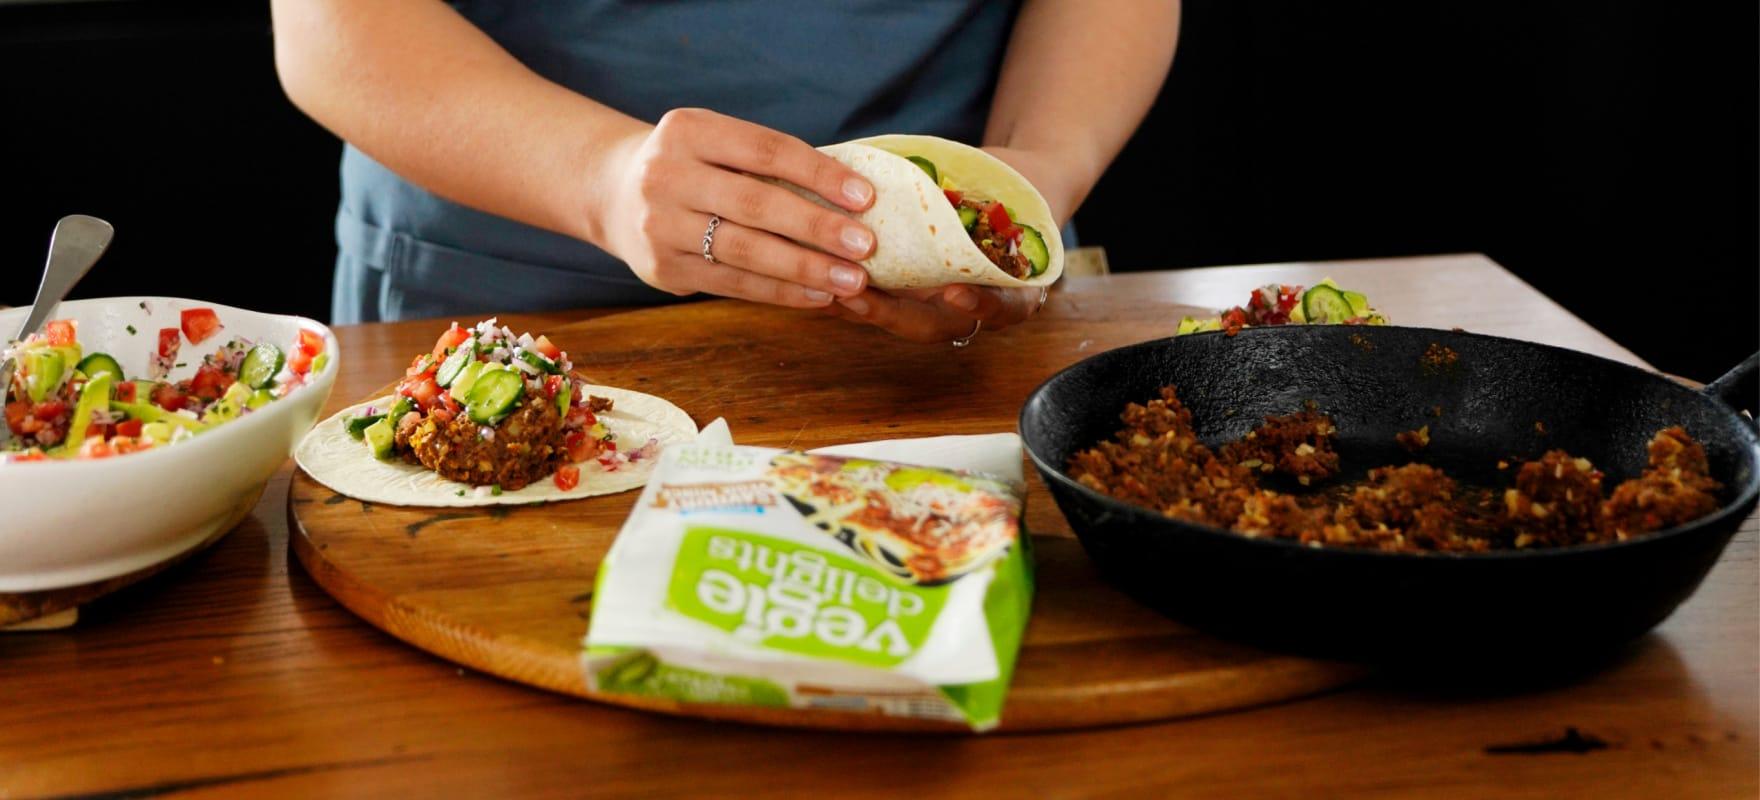 Savory mince tacos with salsa image 1